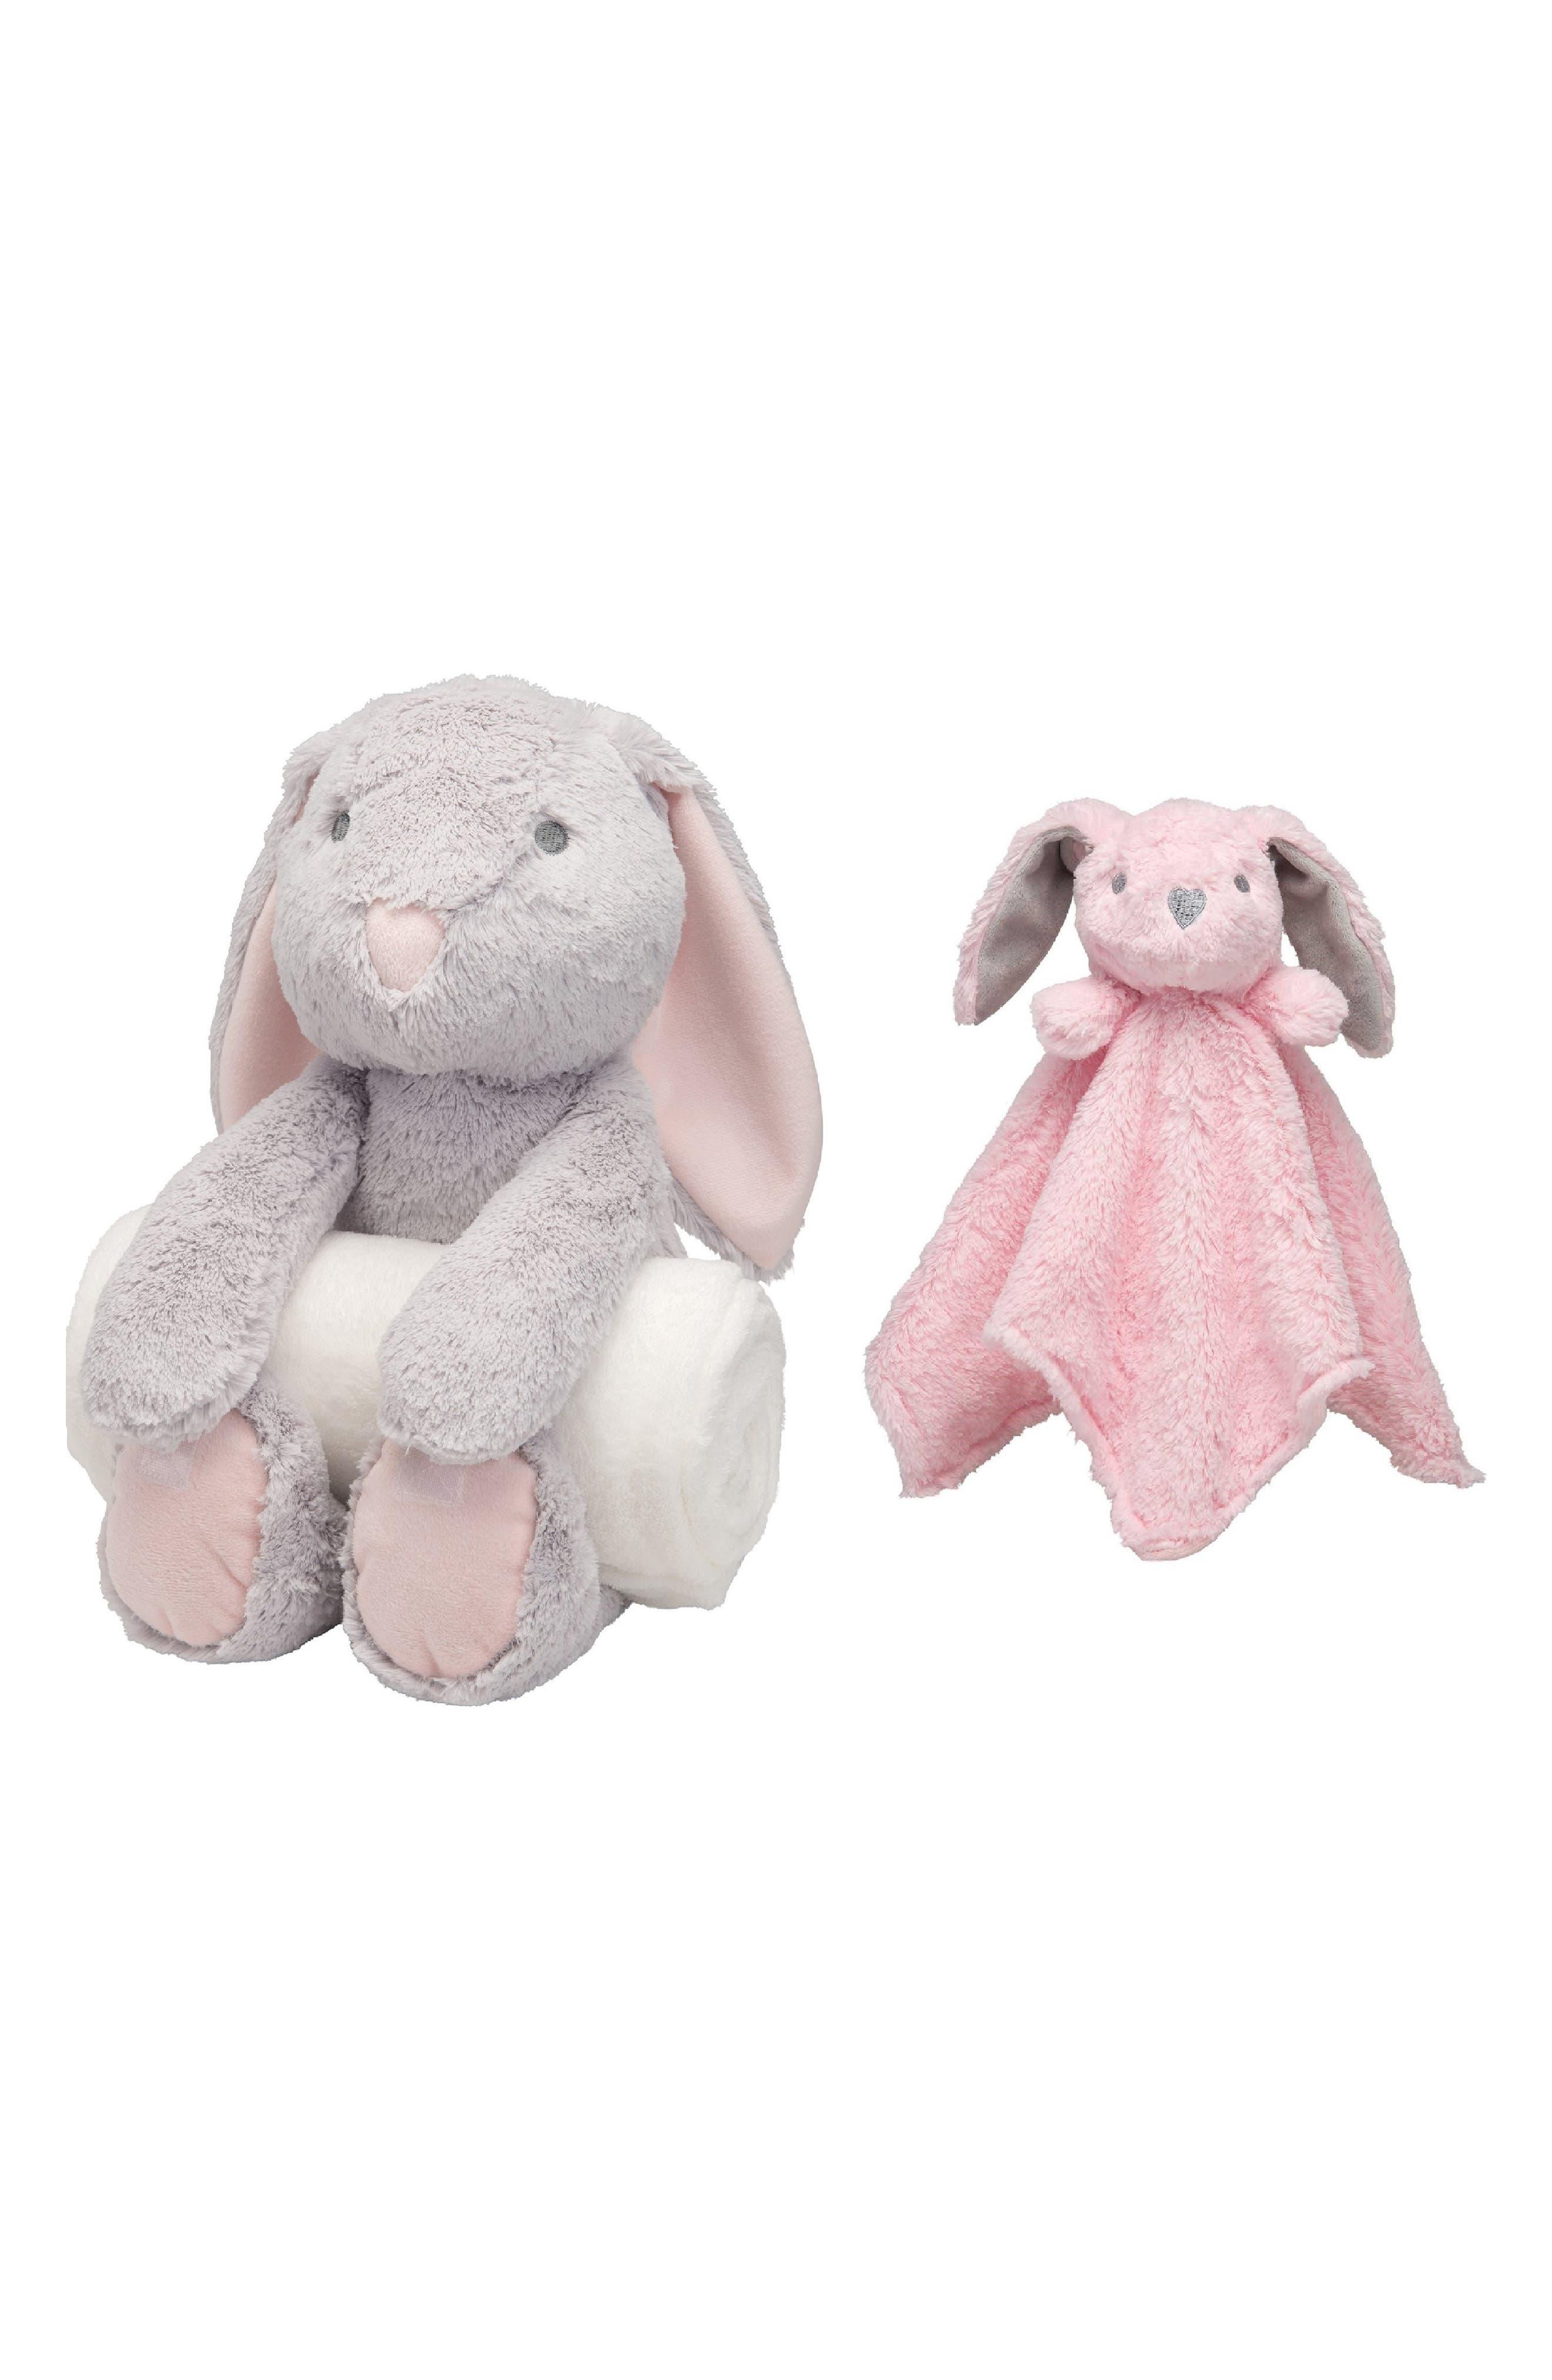 Elegant Baby Bunny Bedtime Huggie Stuffed Animal Blanket Security